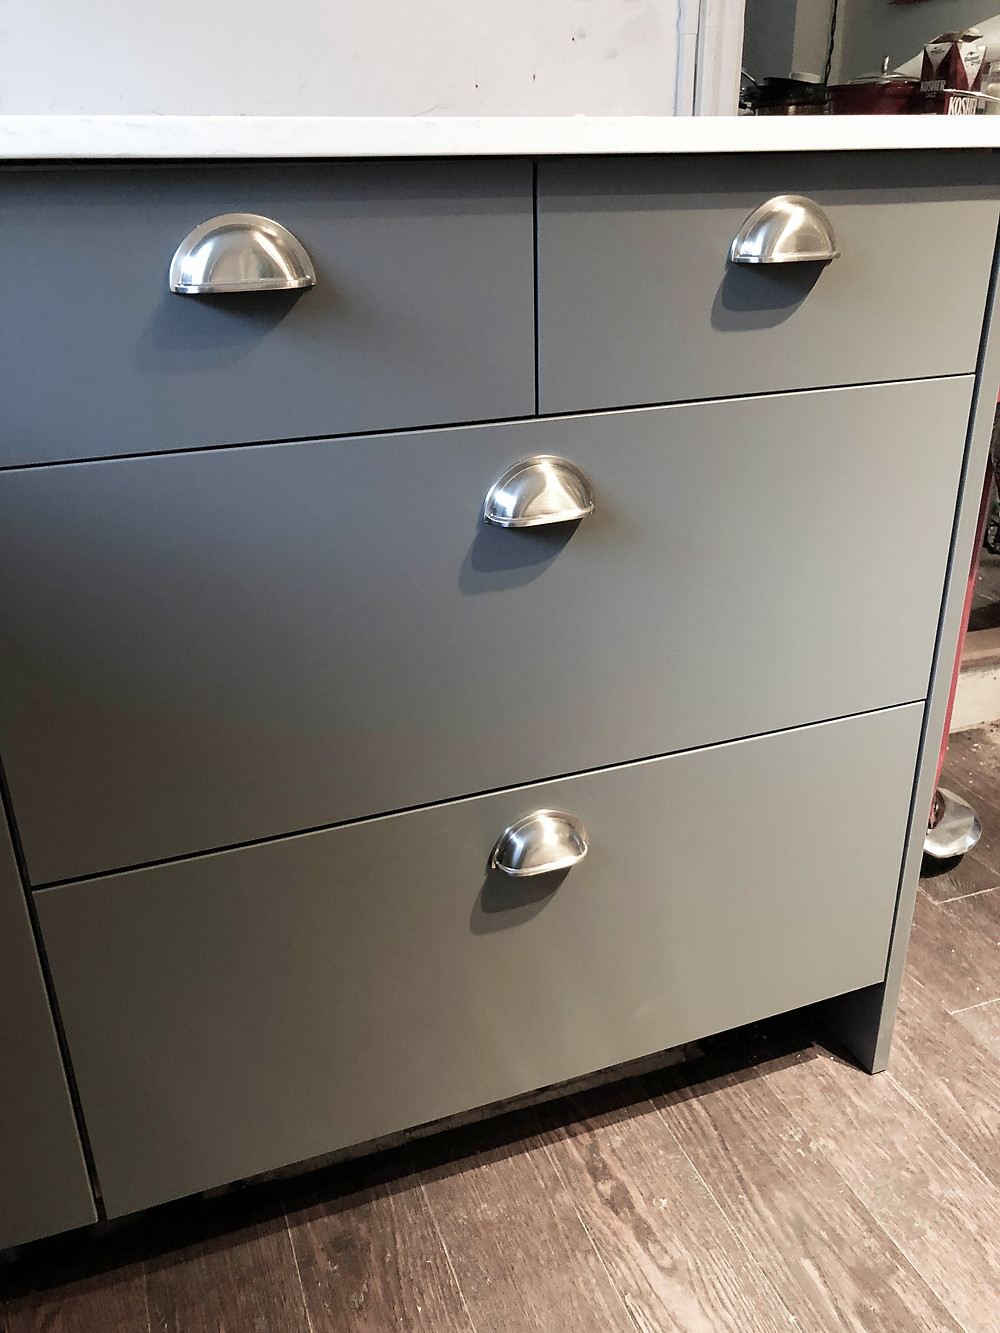 Matt kitchen cabinets in Toronto - new handles